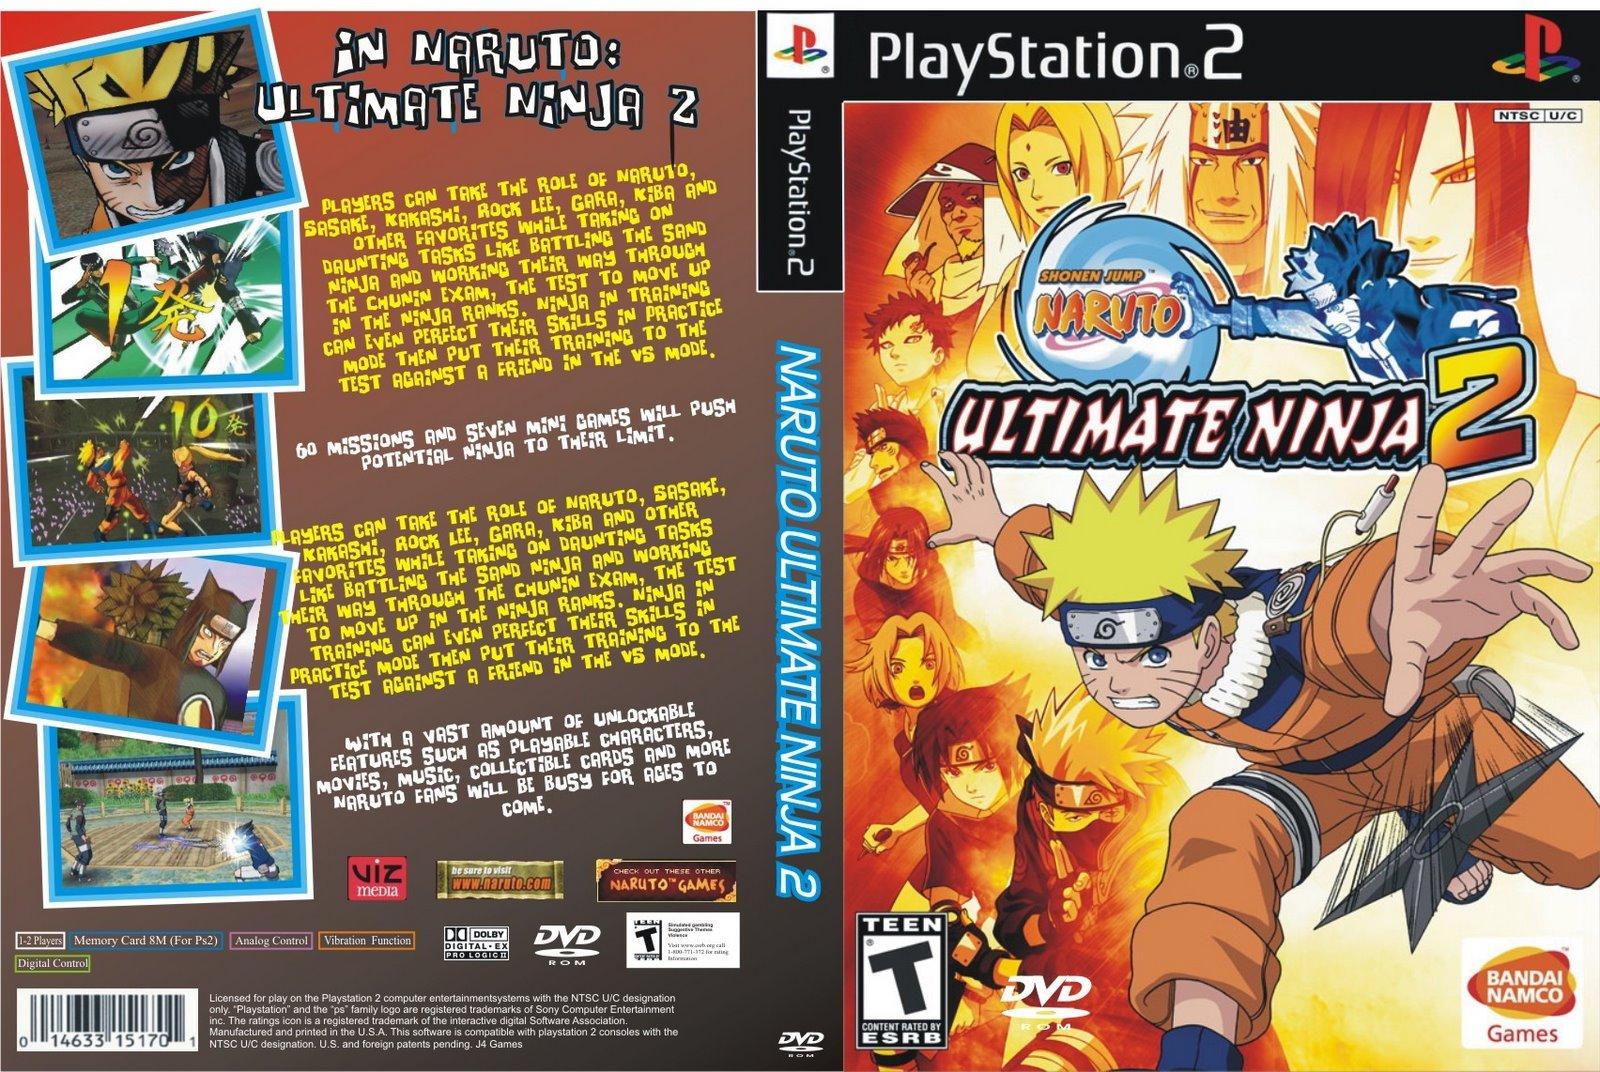 Naruto ninja 5